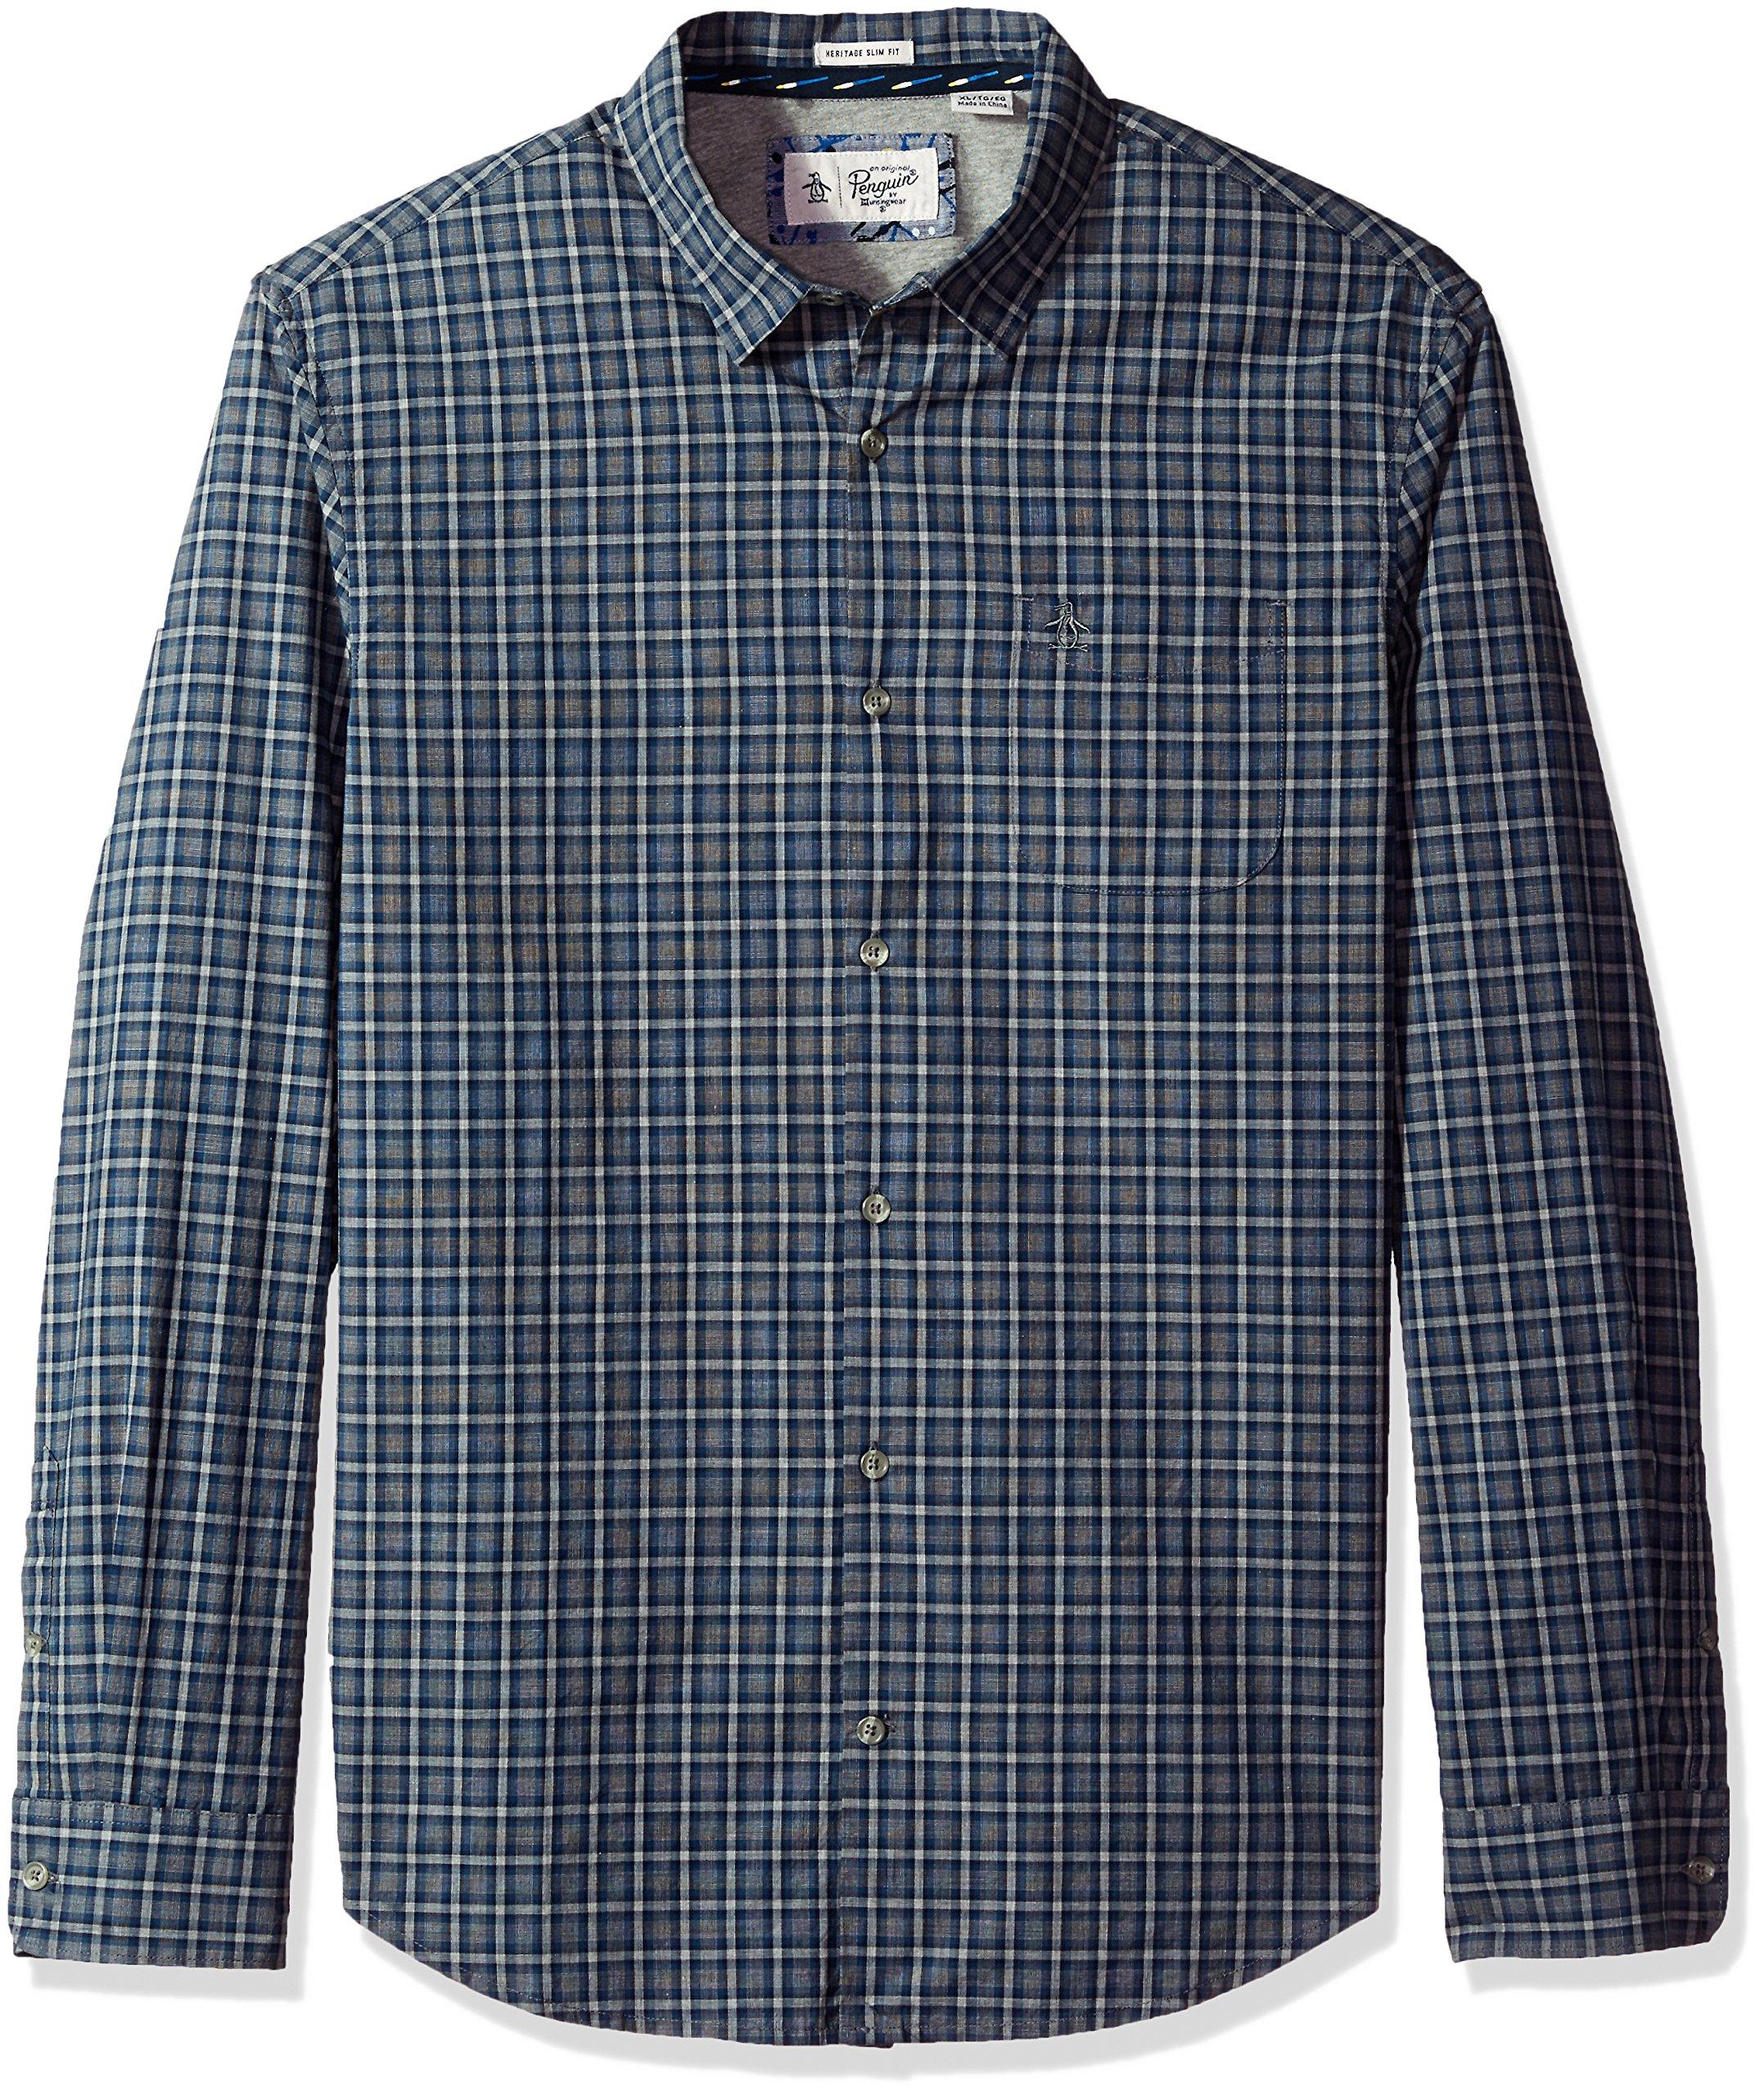 Original Penguin Men's Heathered Plaid Dress Shirt, Snorkel Blue, Extra Large